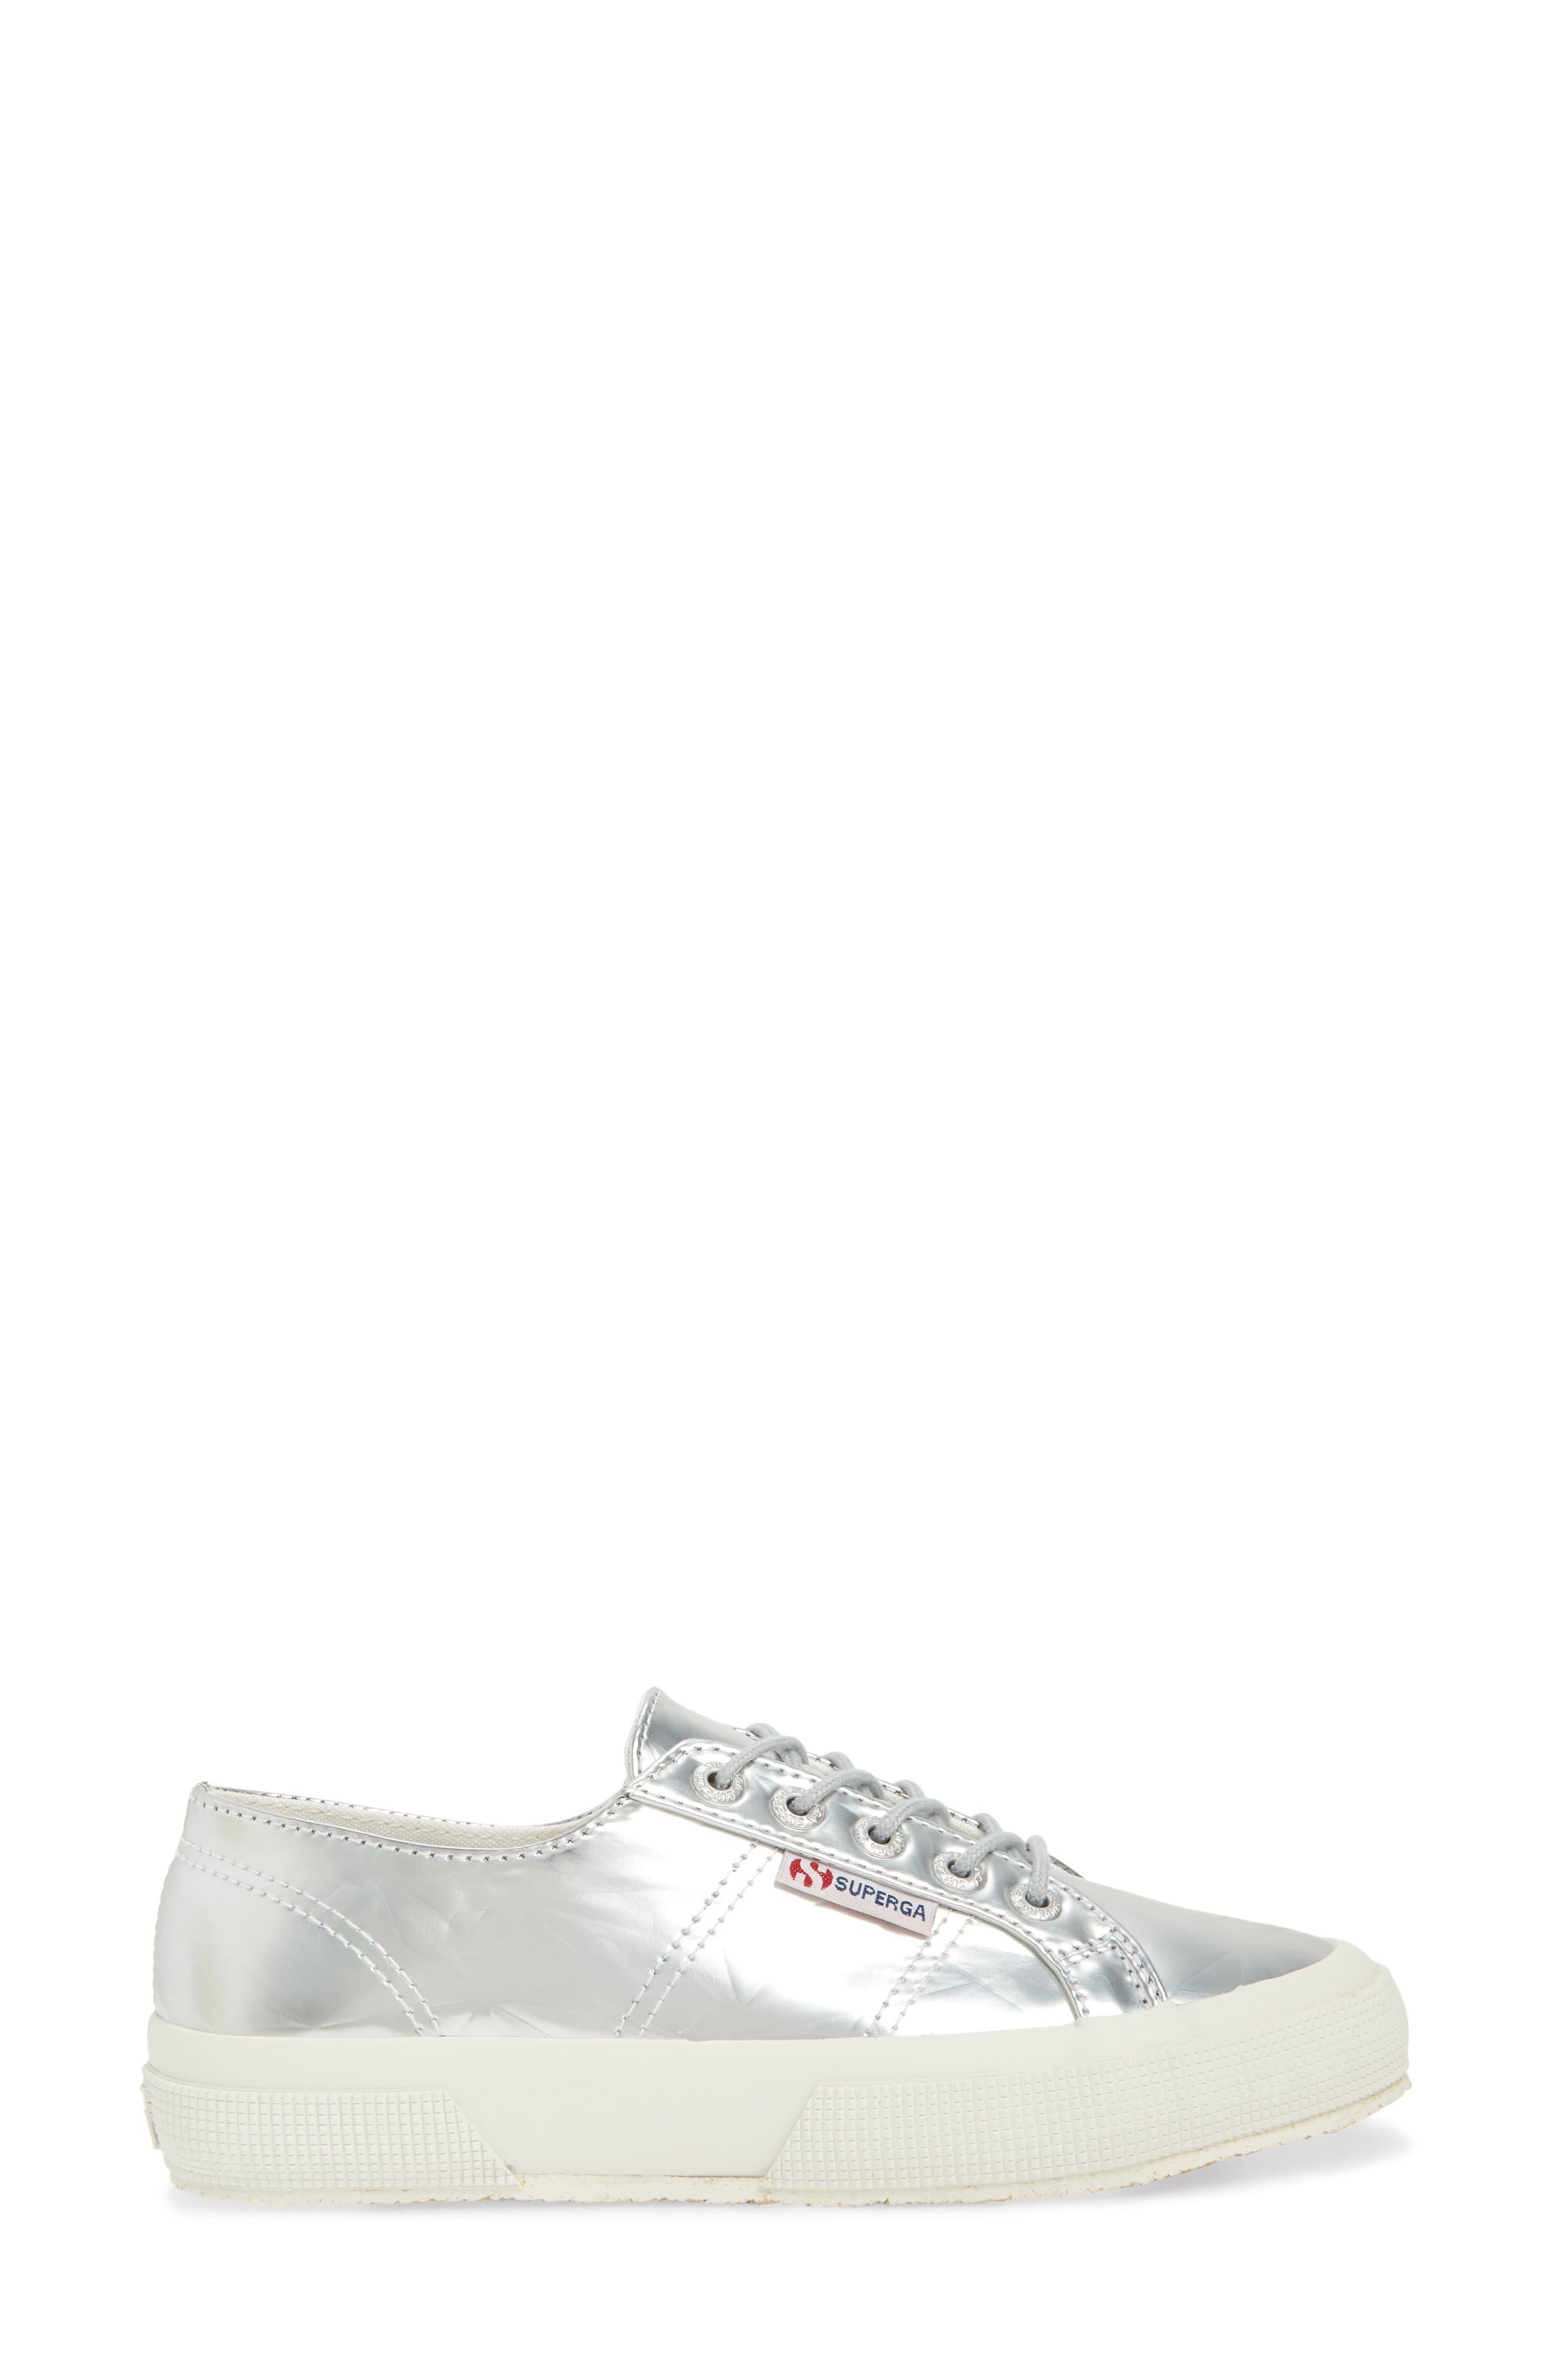 2750 Synleadiamondmirror Sneaker,                             Alternate thumbnail 3, color,                             040